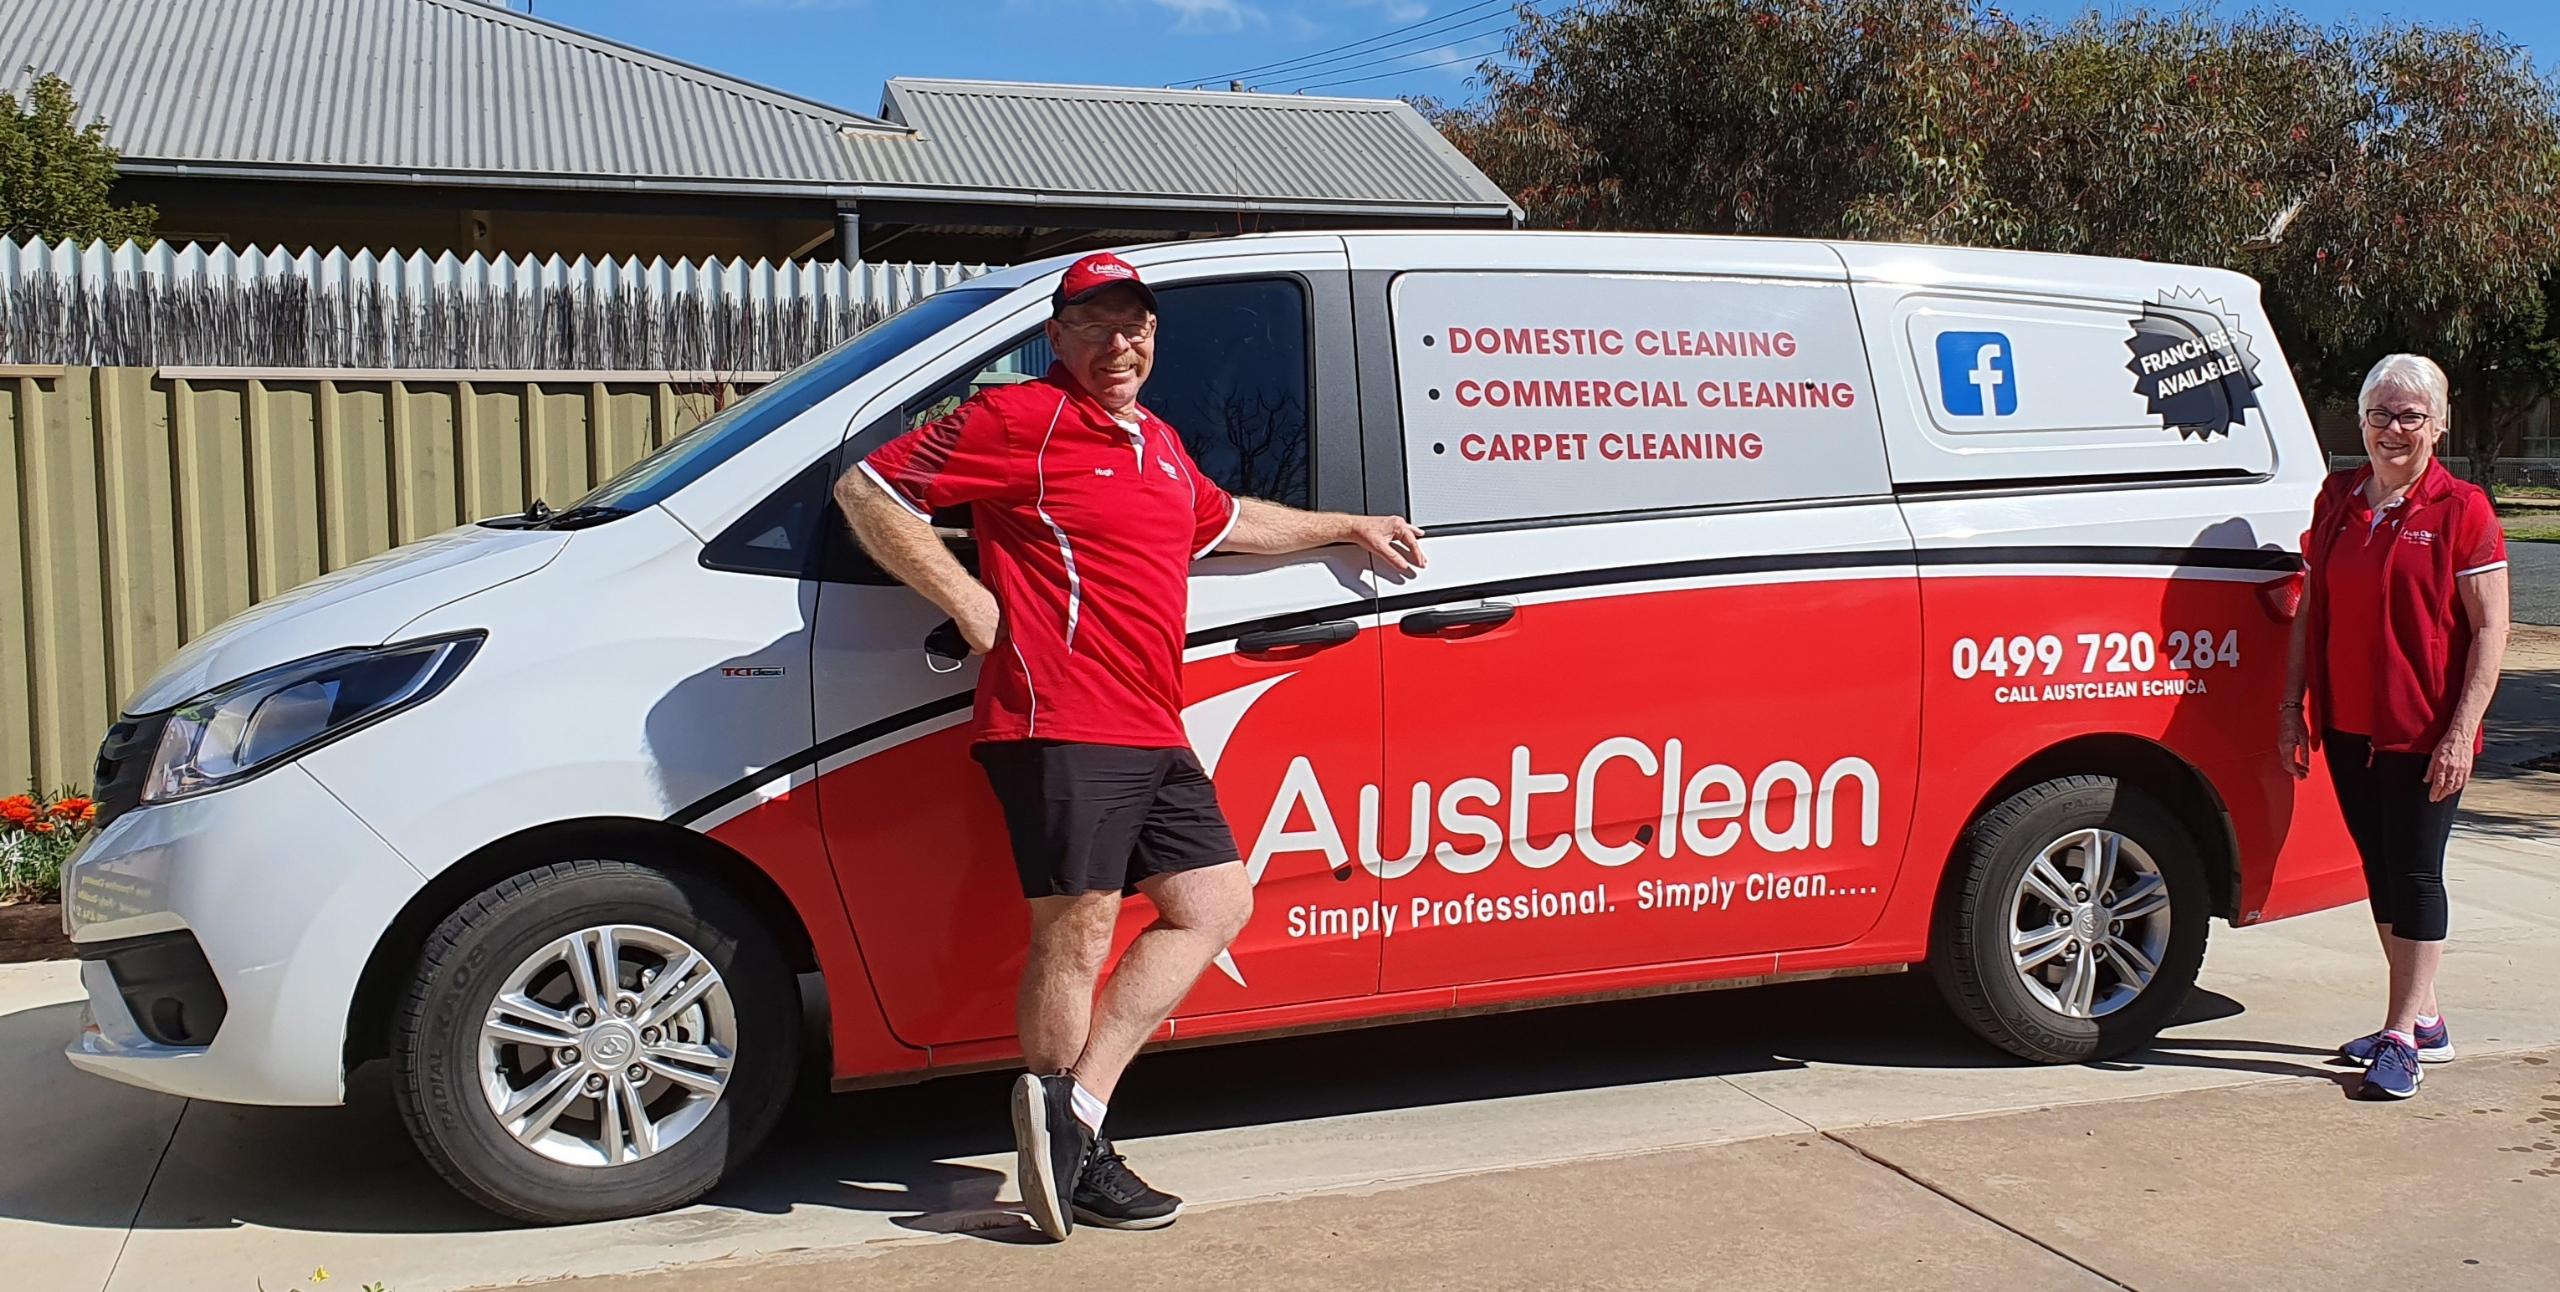 Austclean Echuca cleaners